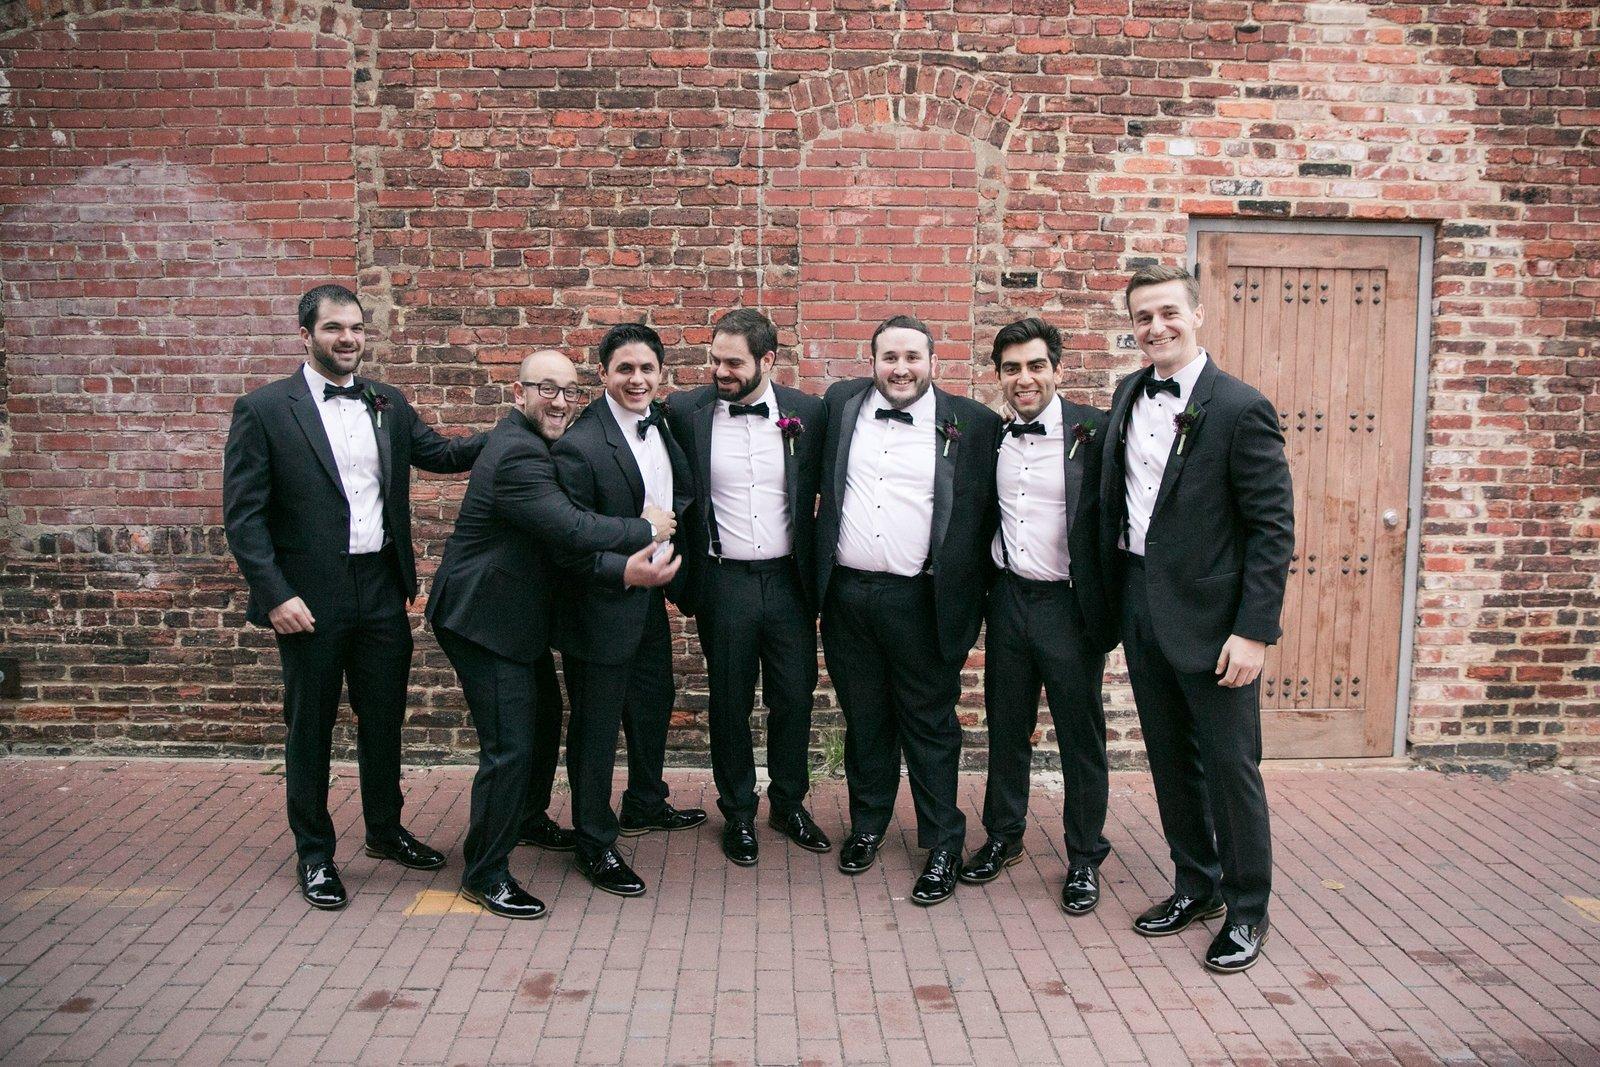 Black-tie-wedding-photos-longview-gallery-dc (173)